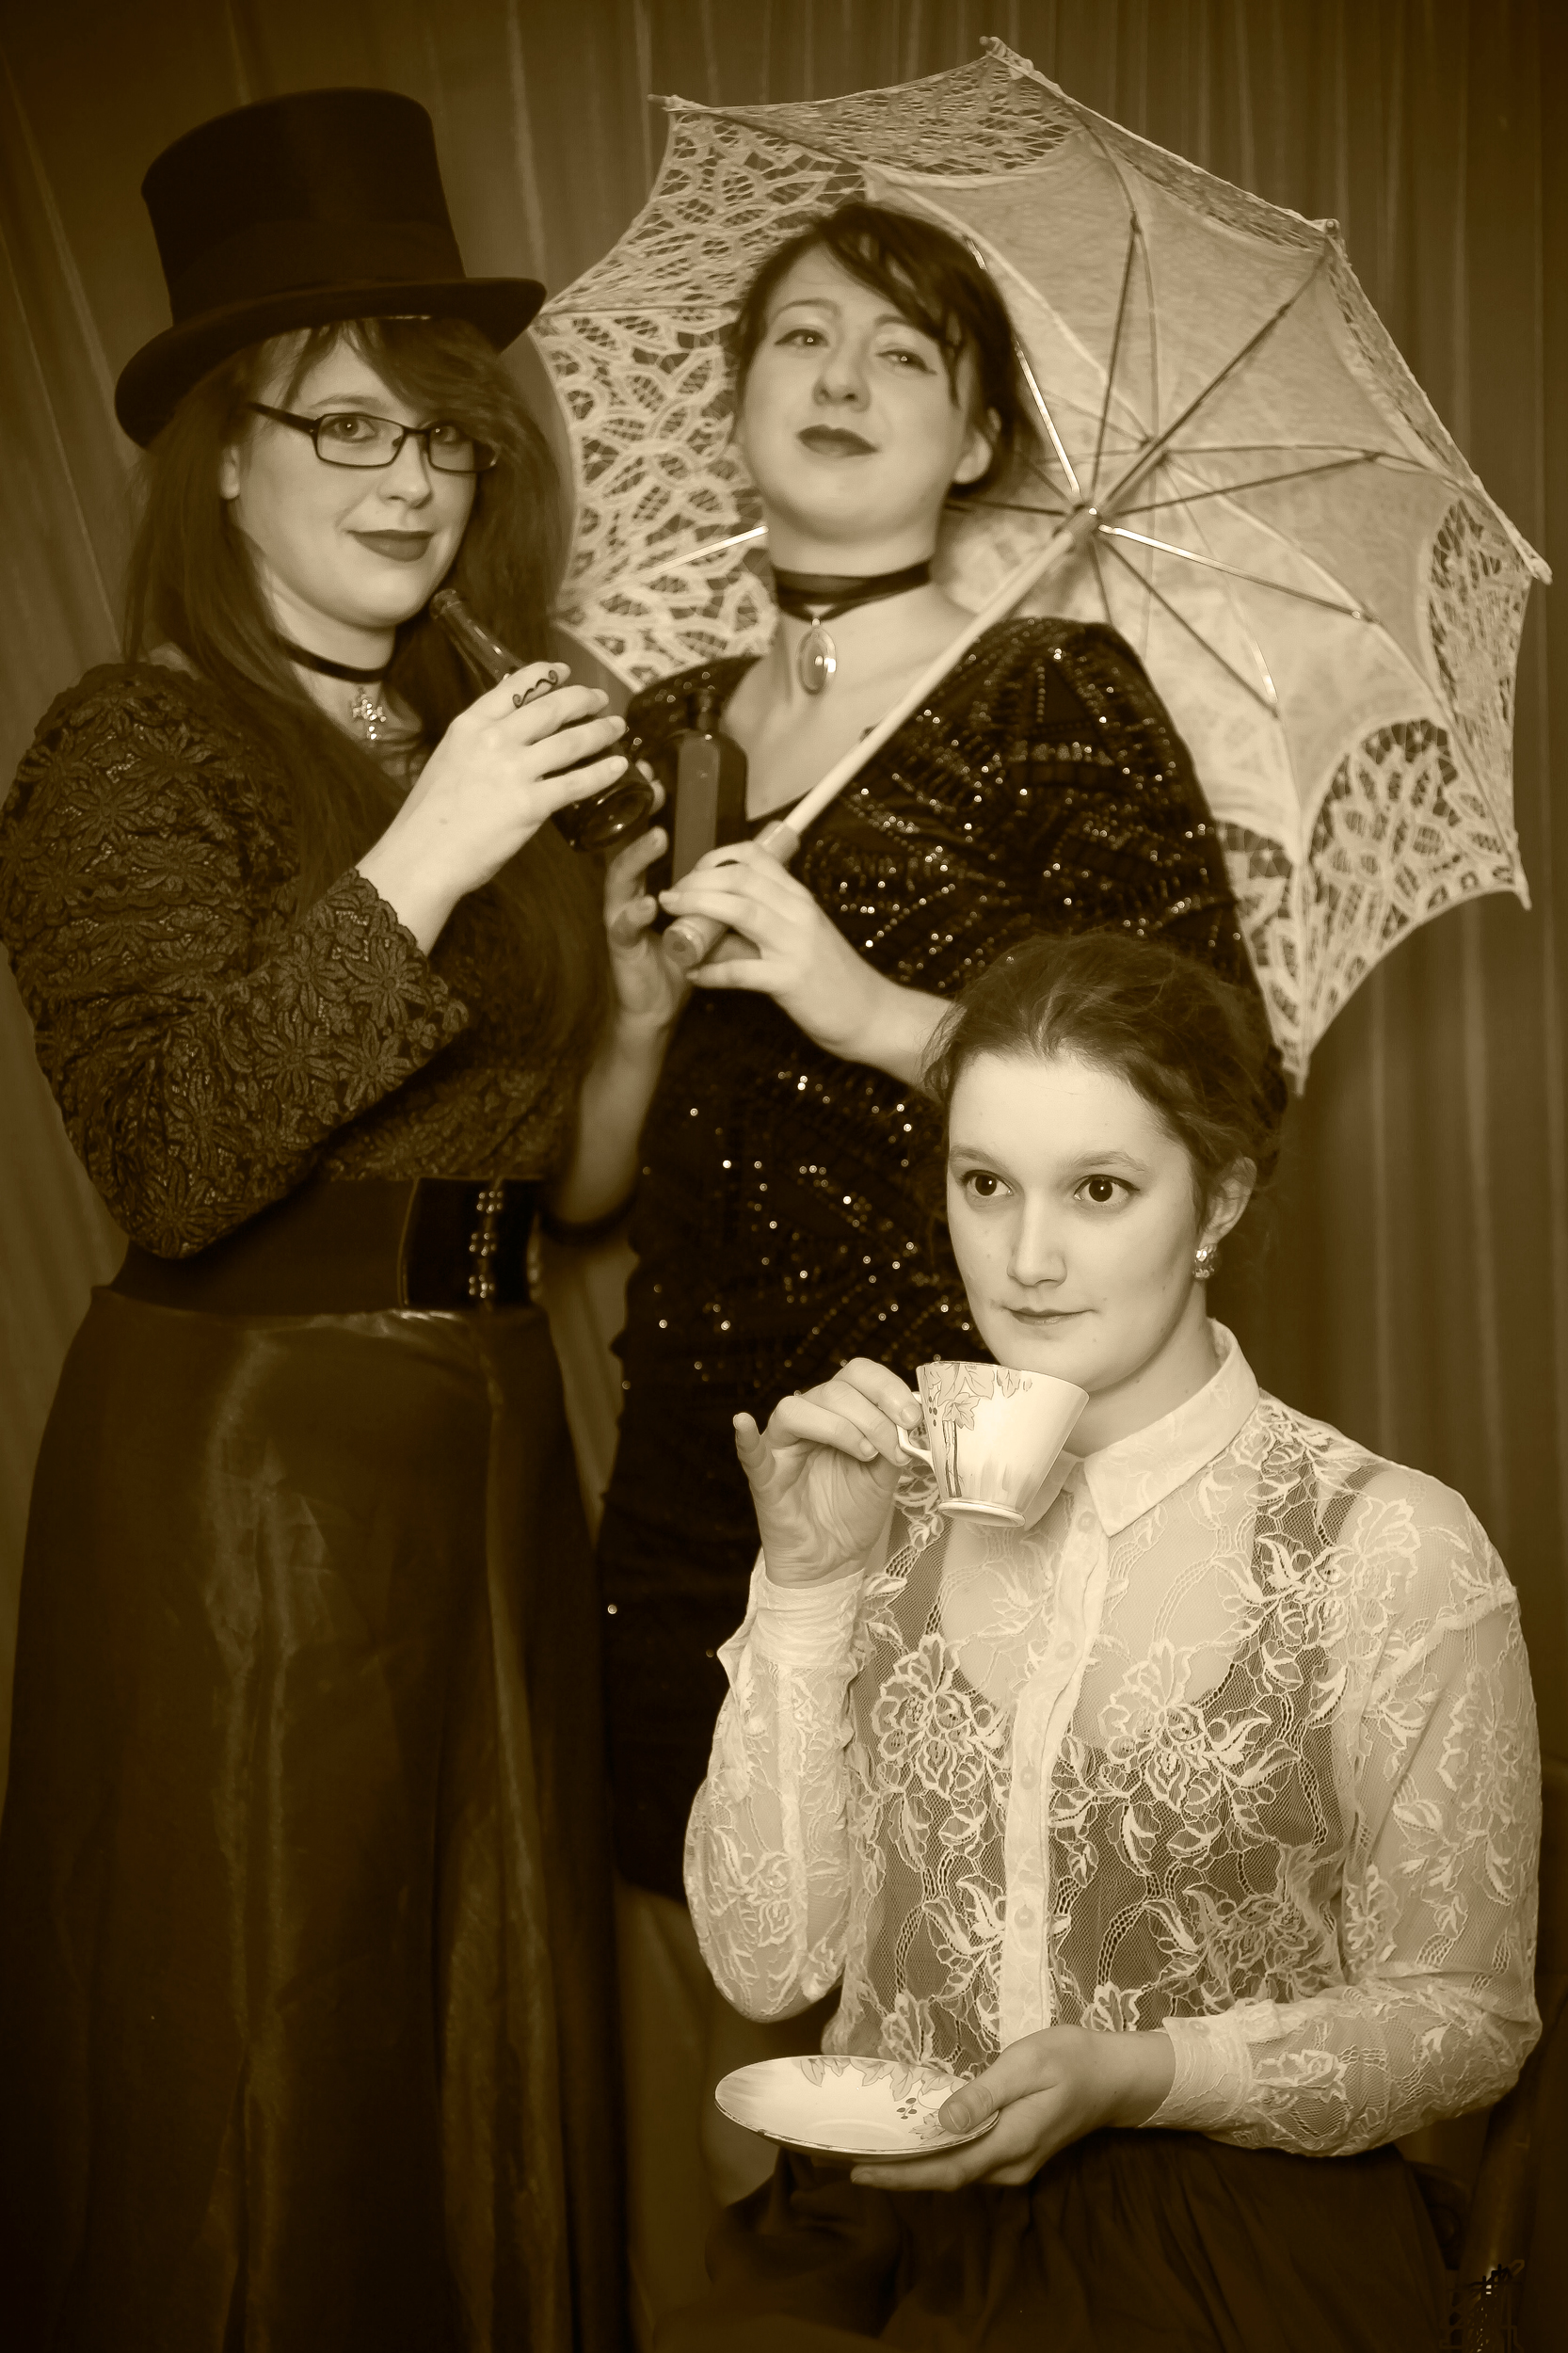 Gladys-&-the-Bubblettes-Photo-Booth-Scotland_224.jpg